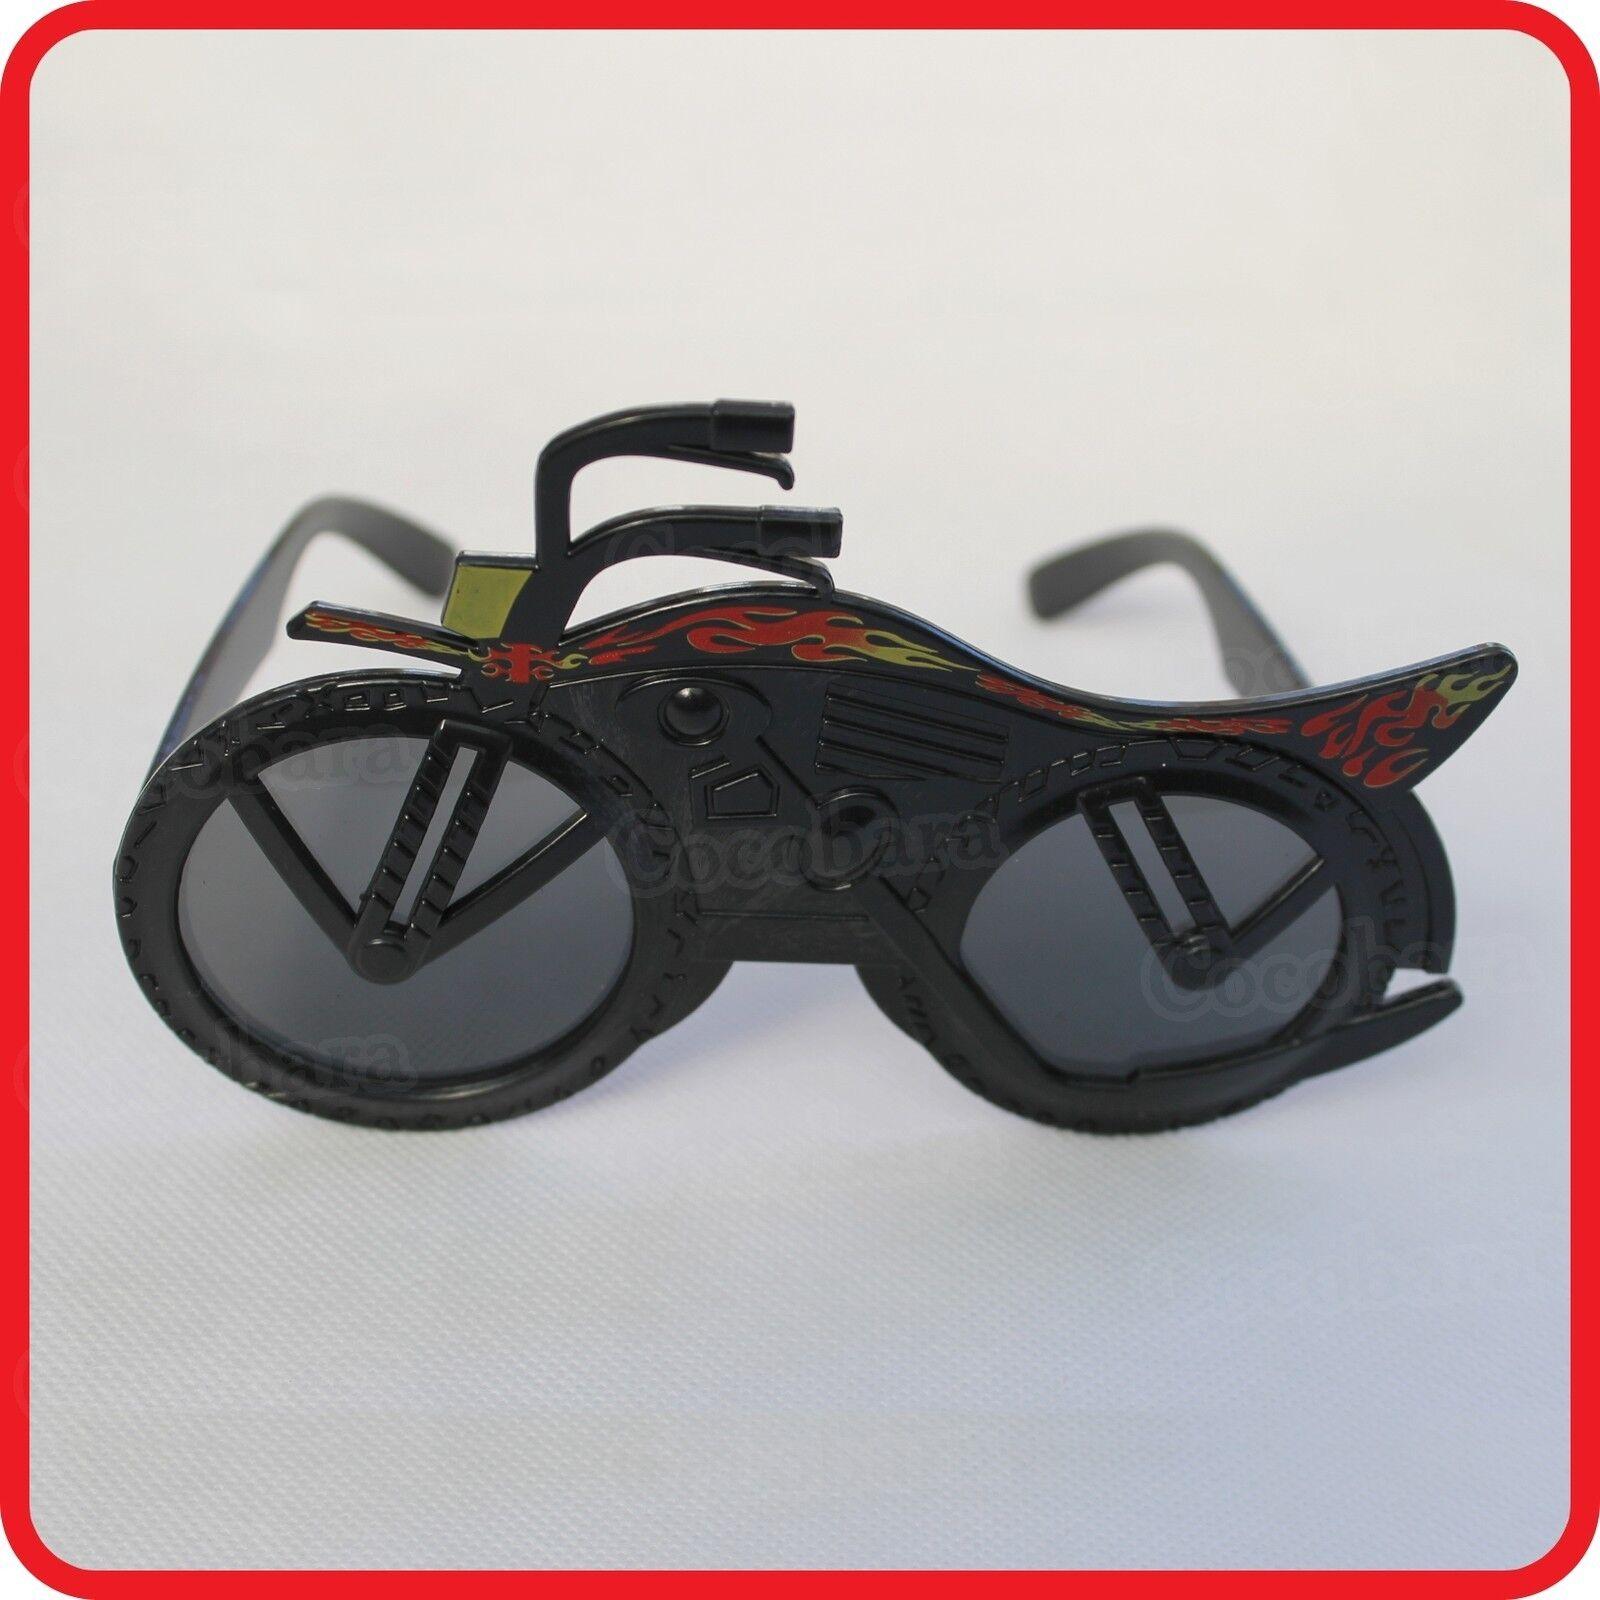 MOTORCYCLES MOTORBIKE MOTOR VEHICLE GLASSES SUNGLASSES-COSTUME-DRESS UP-PARTY